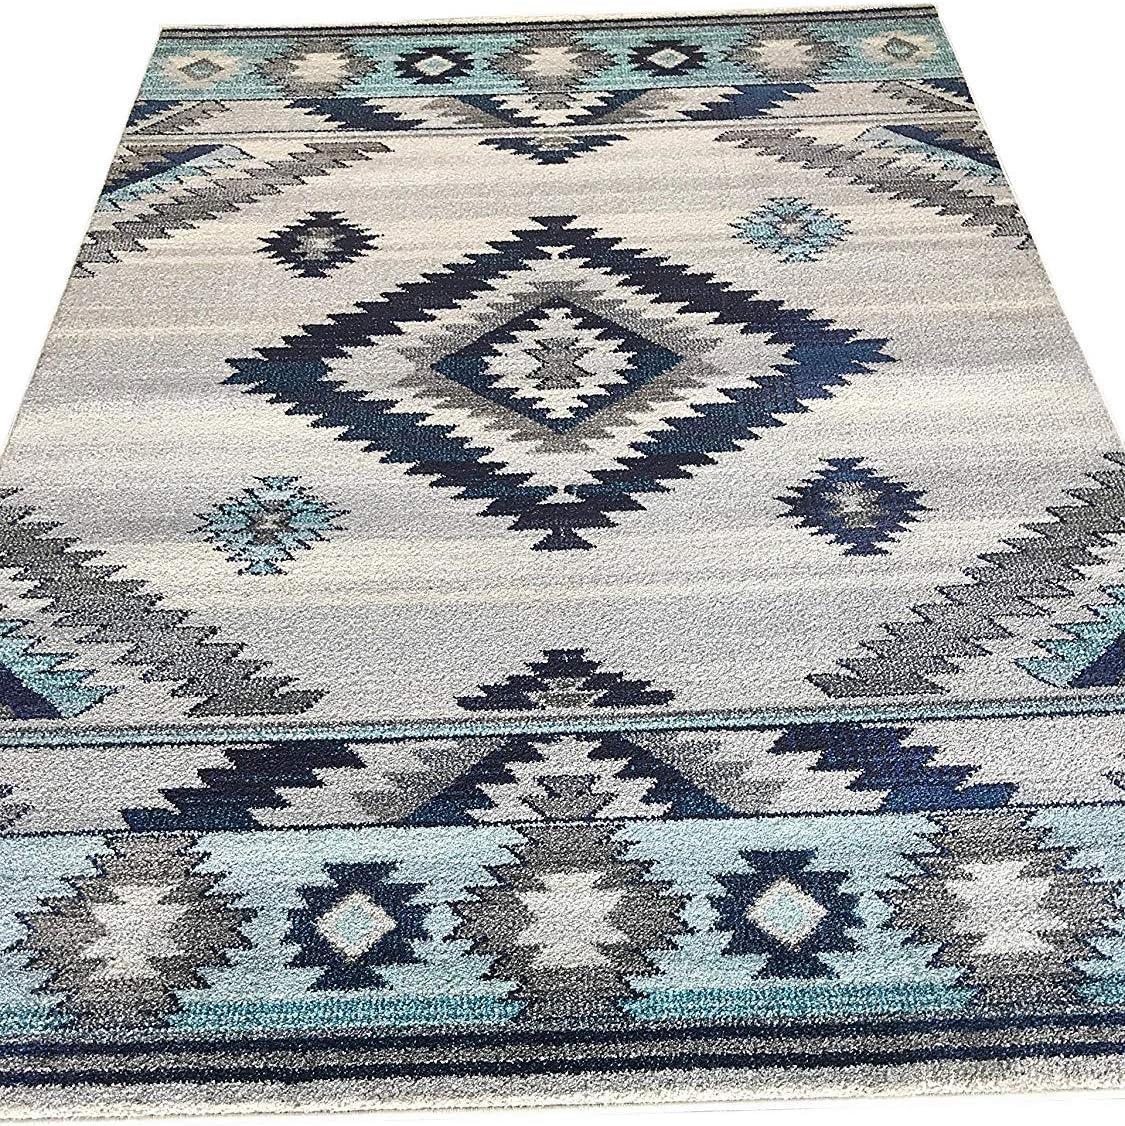 South West Native American Indian Area Rug Turquoise Purple Beige Blue Brown Bone Design 1033 7 Feet 9 Inch X 10 Feet